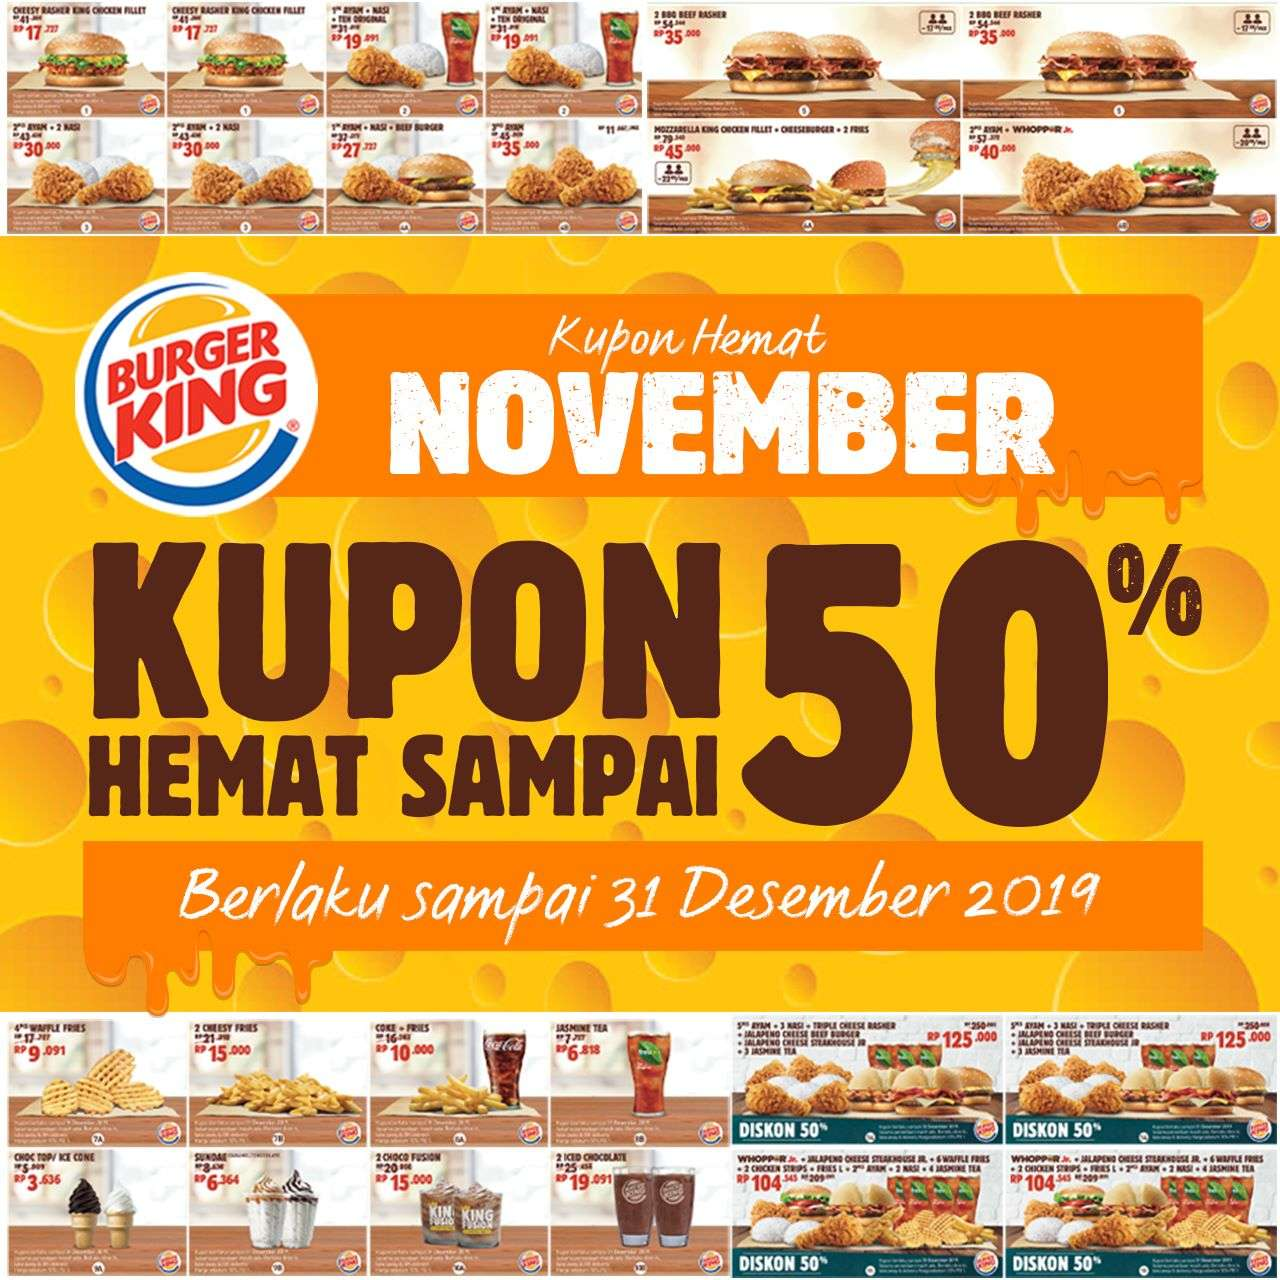 Burger King Promo Kupon Hemat November 2019 Diskon Hingga 50%